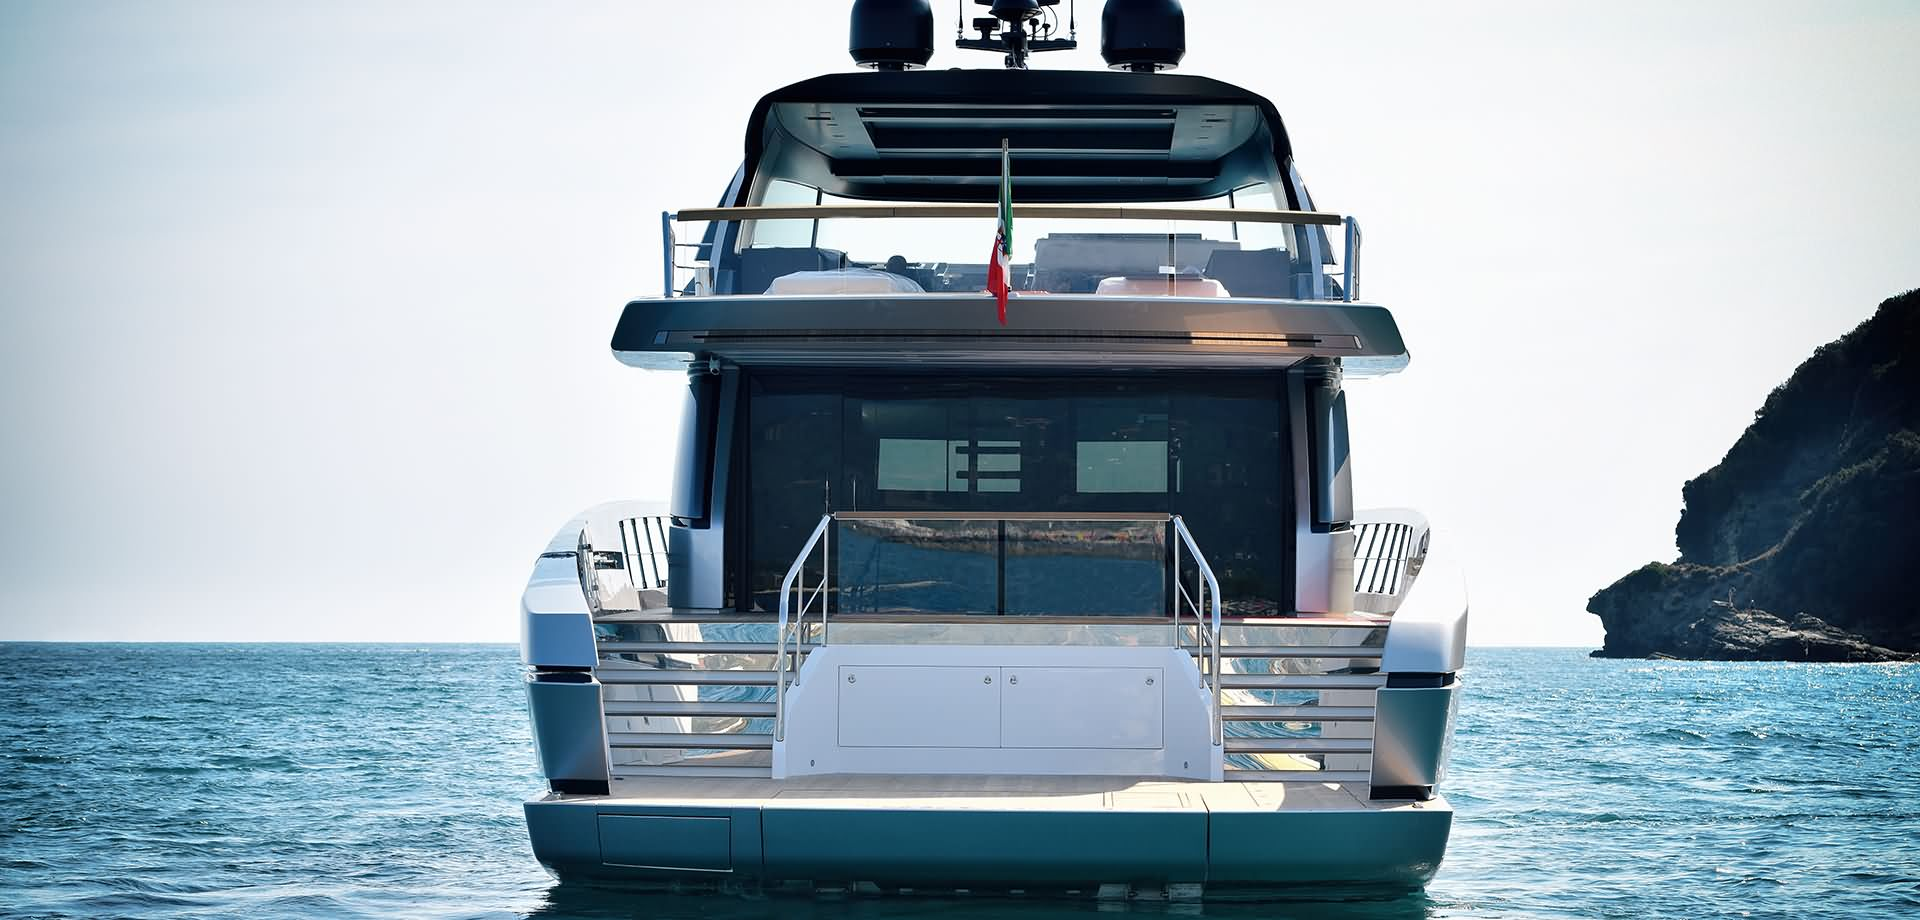 New Sanlorenzo Sx88 2018 Ita Yachts Canada